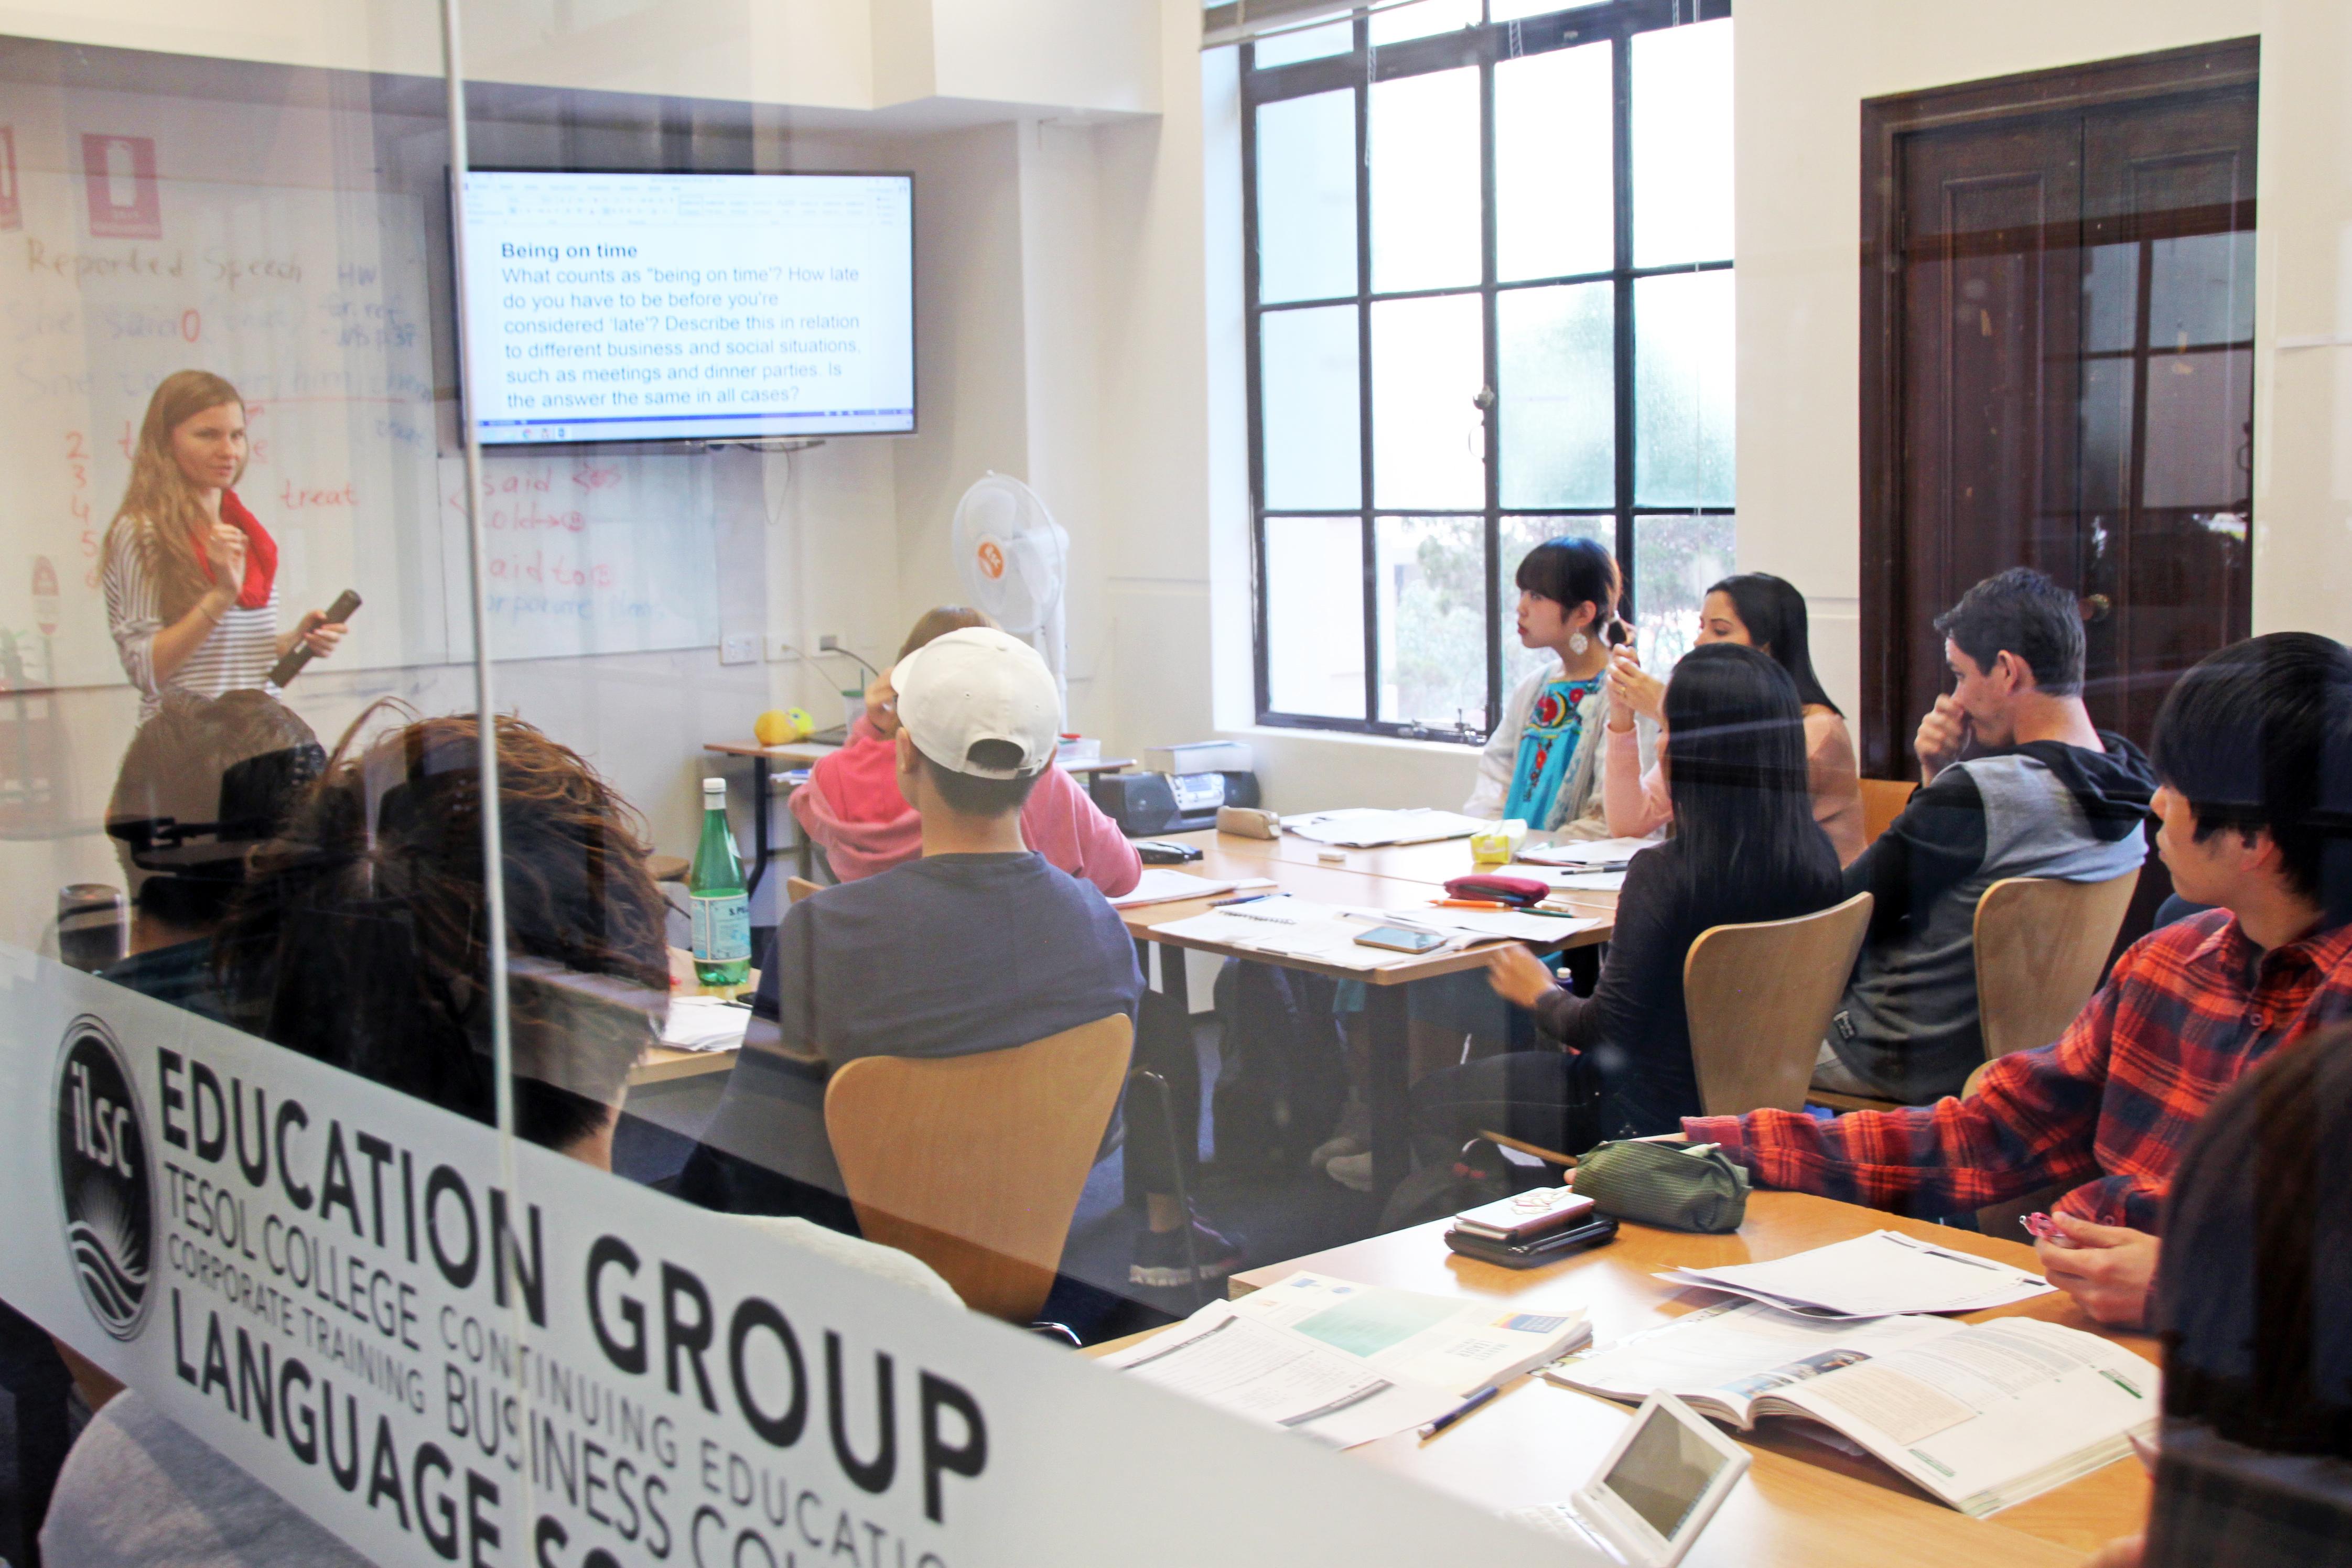 ilsc-brisbane-campus-classroom-1